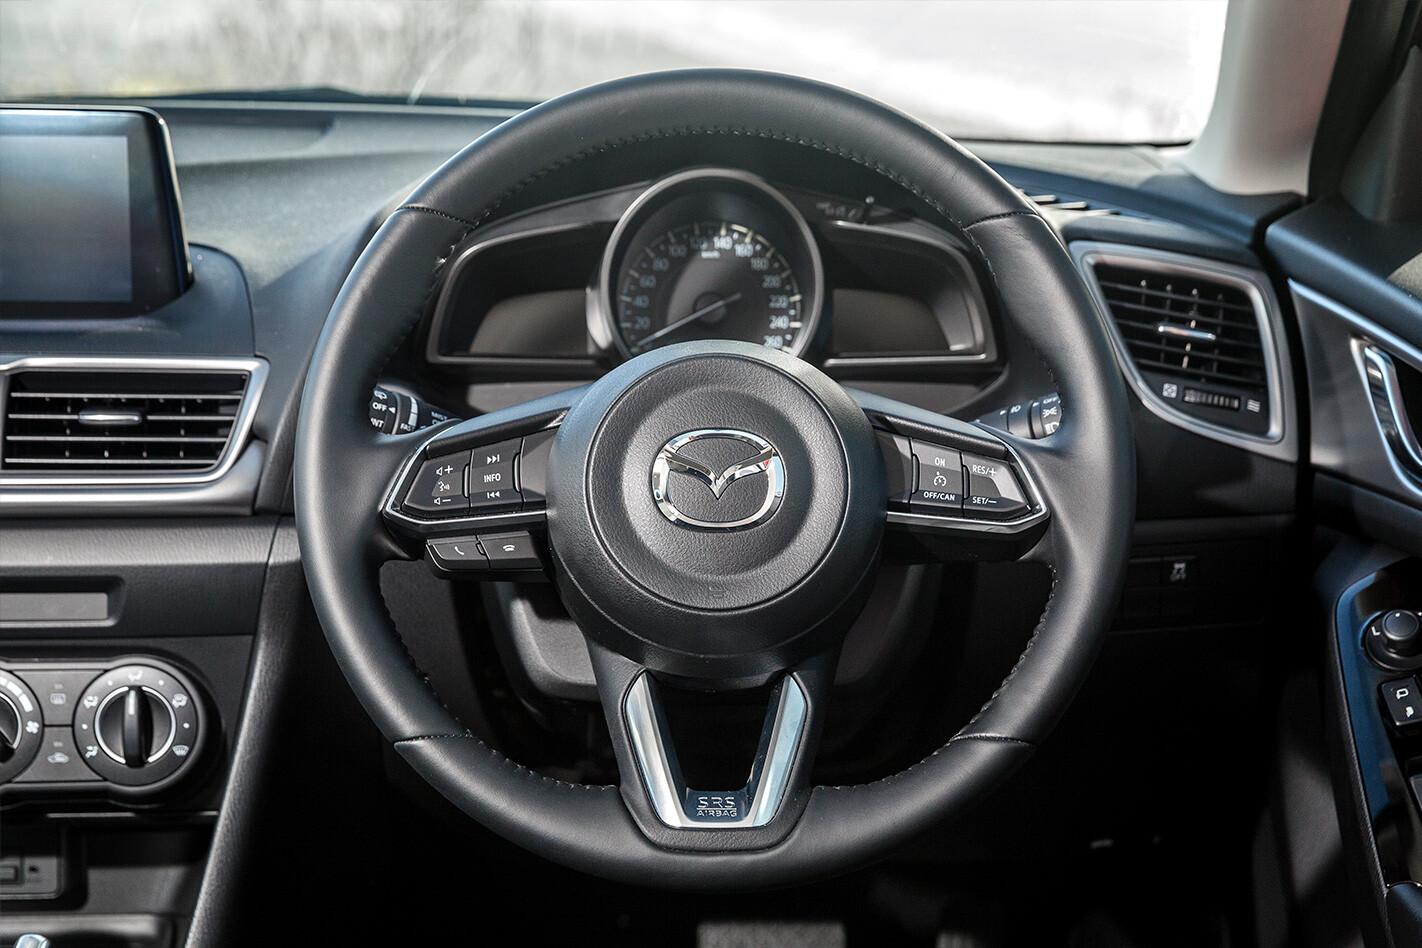 Hatchback Three Way Mazda 3 Interior Steering Wheel Jpg